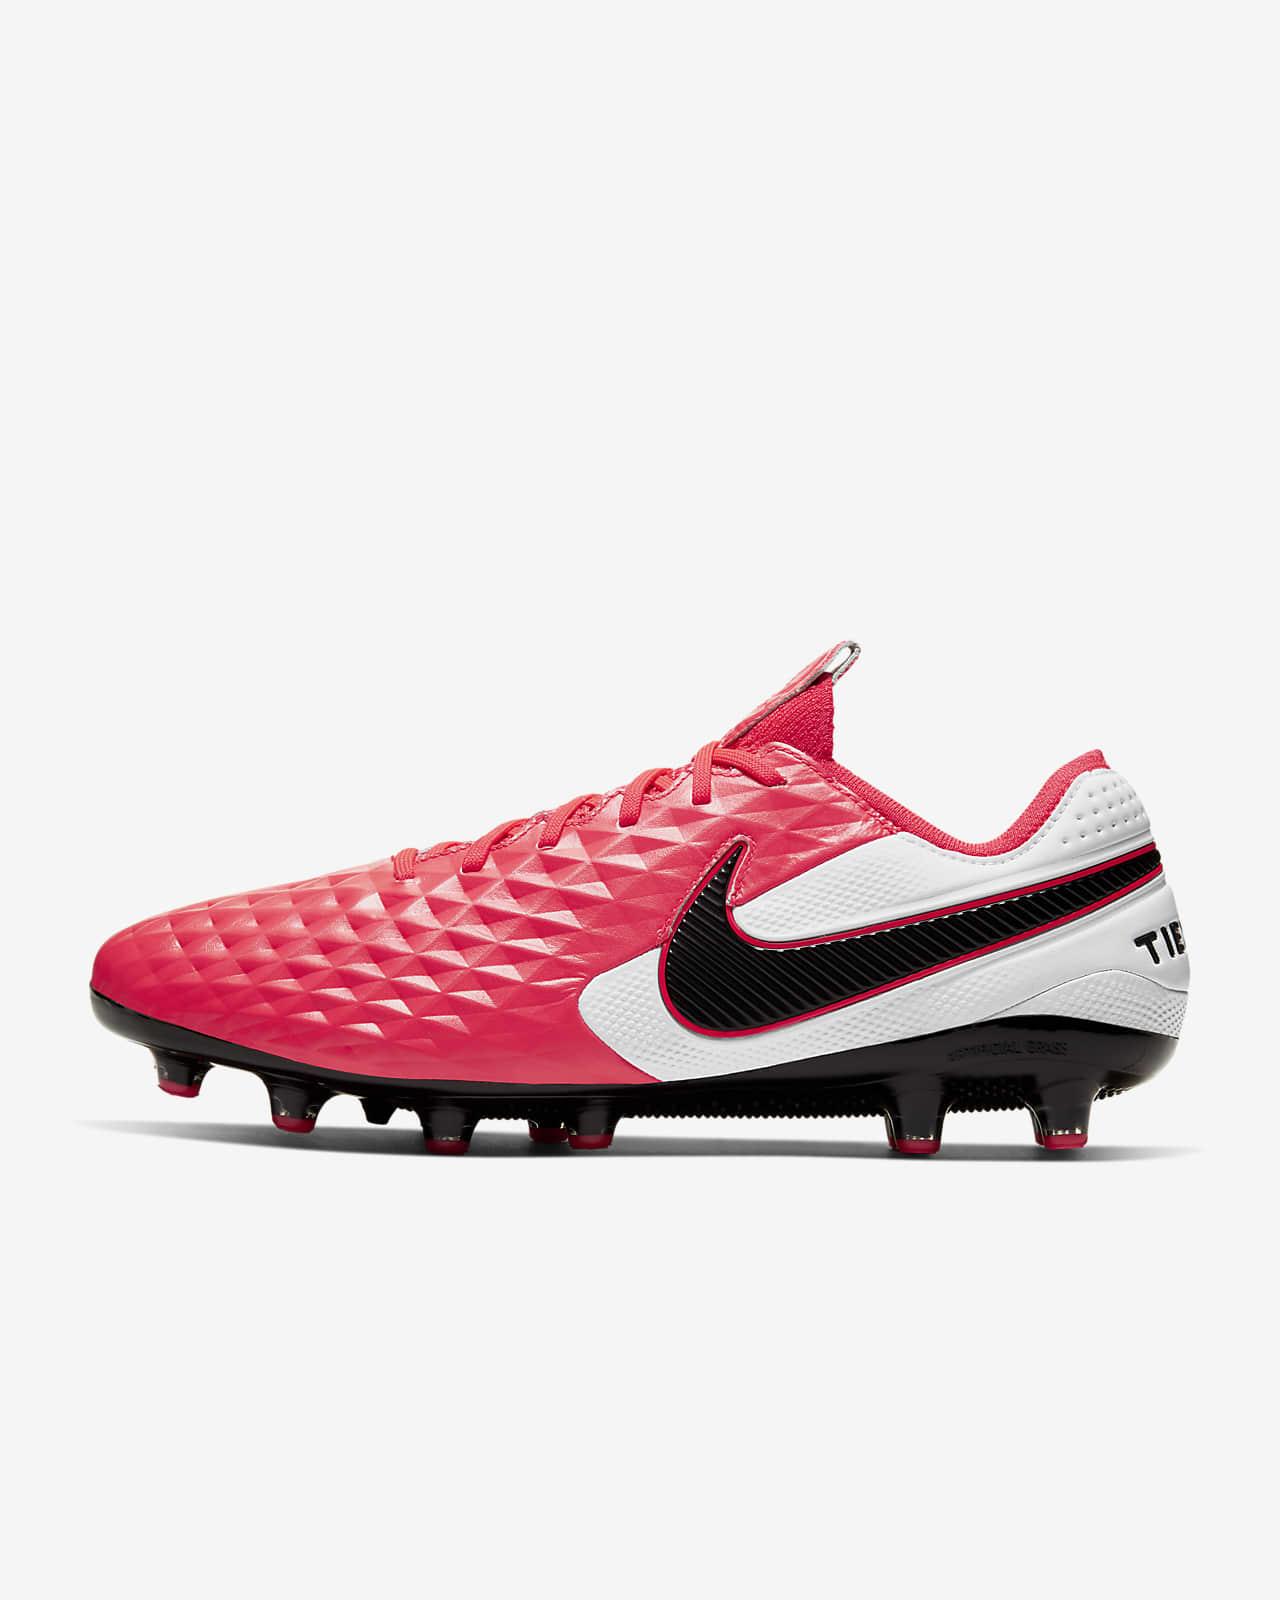 cocinero por ciento Tremendo  Nike Tiempo Legend 8 Elite AG-PRO Artificial-Grass Football Boot. Nike LU